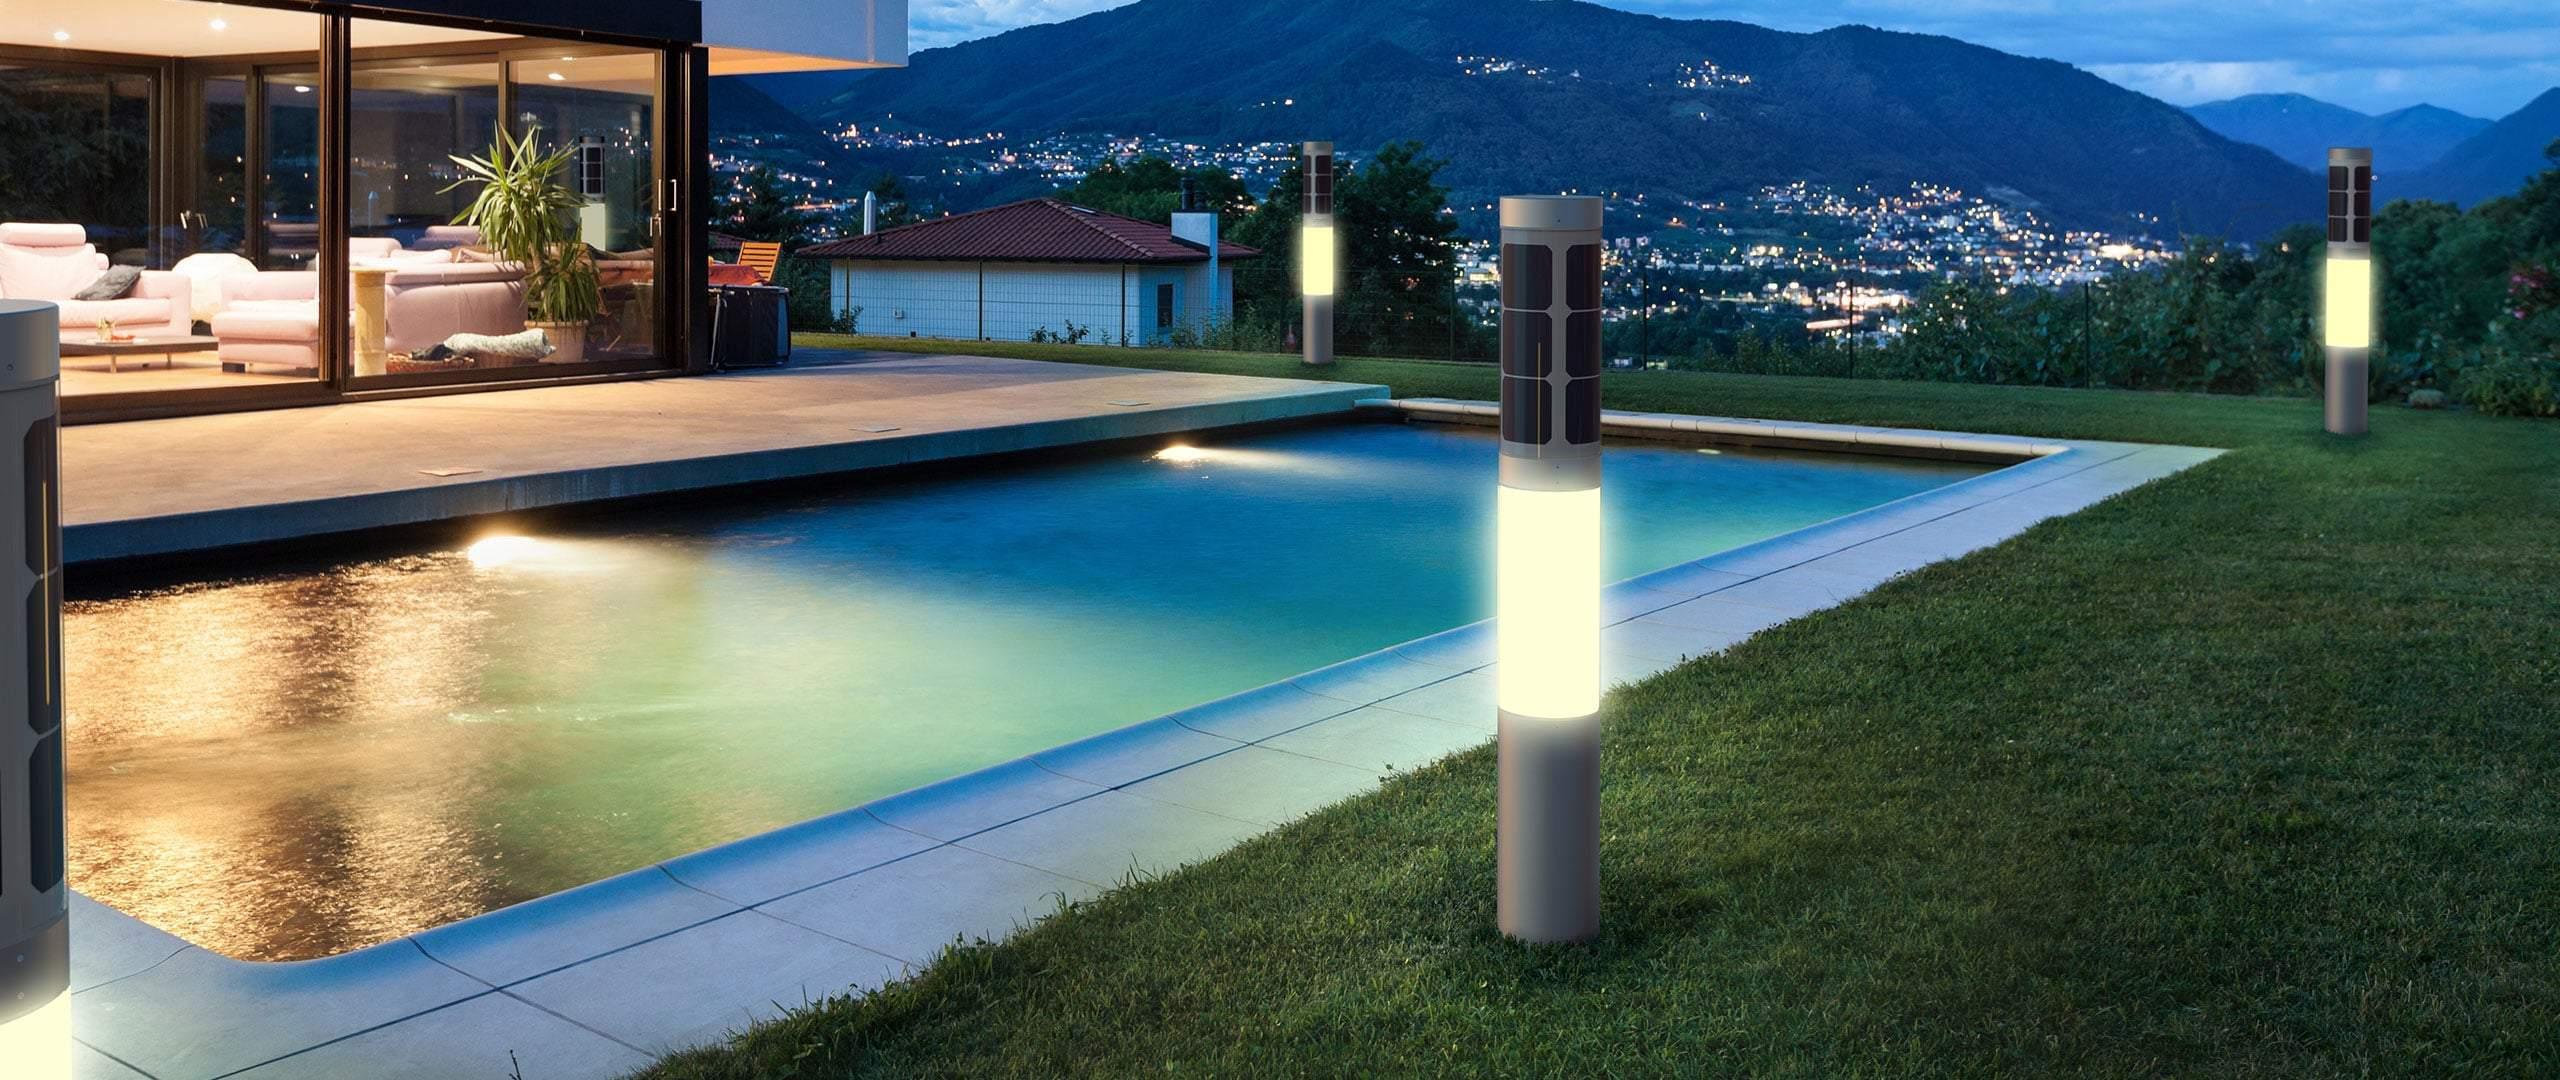 FlexSol NxT farol solar en el jardín de un chalet- Diseño Holandés